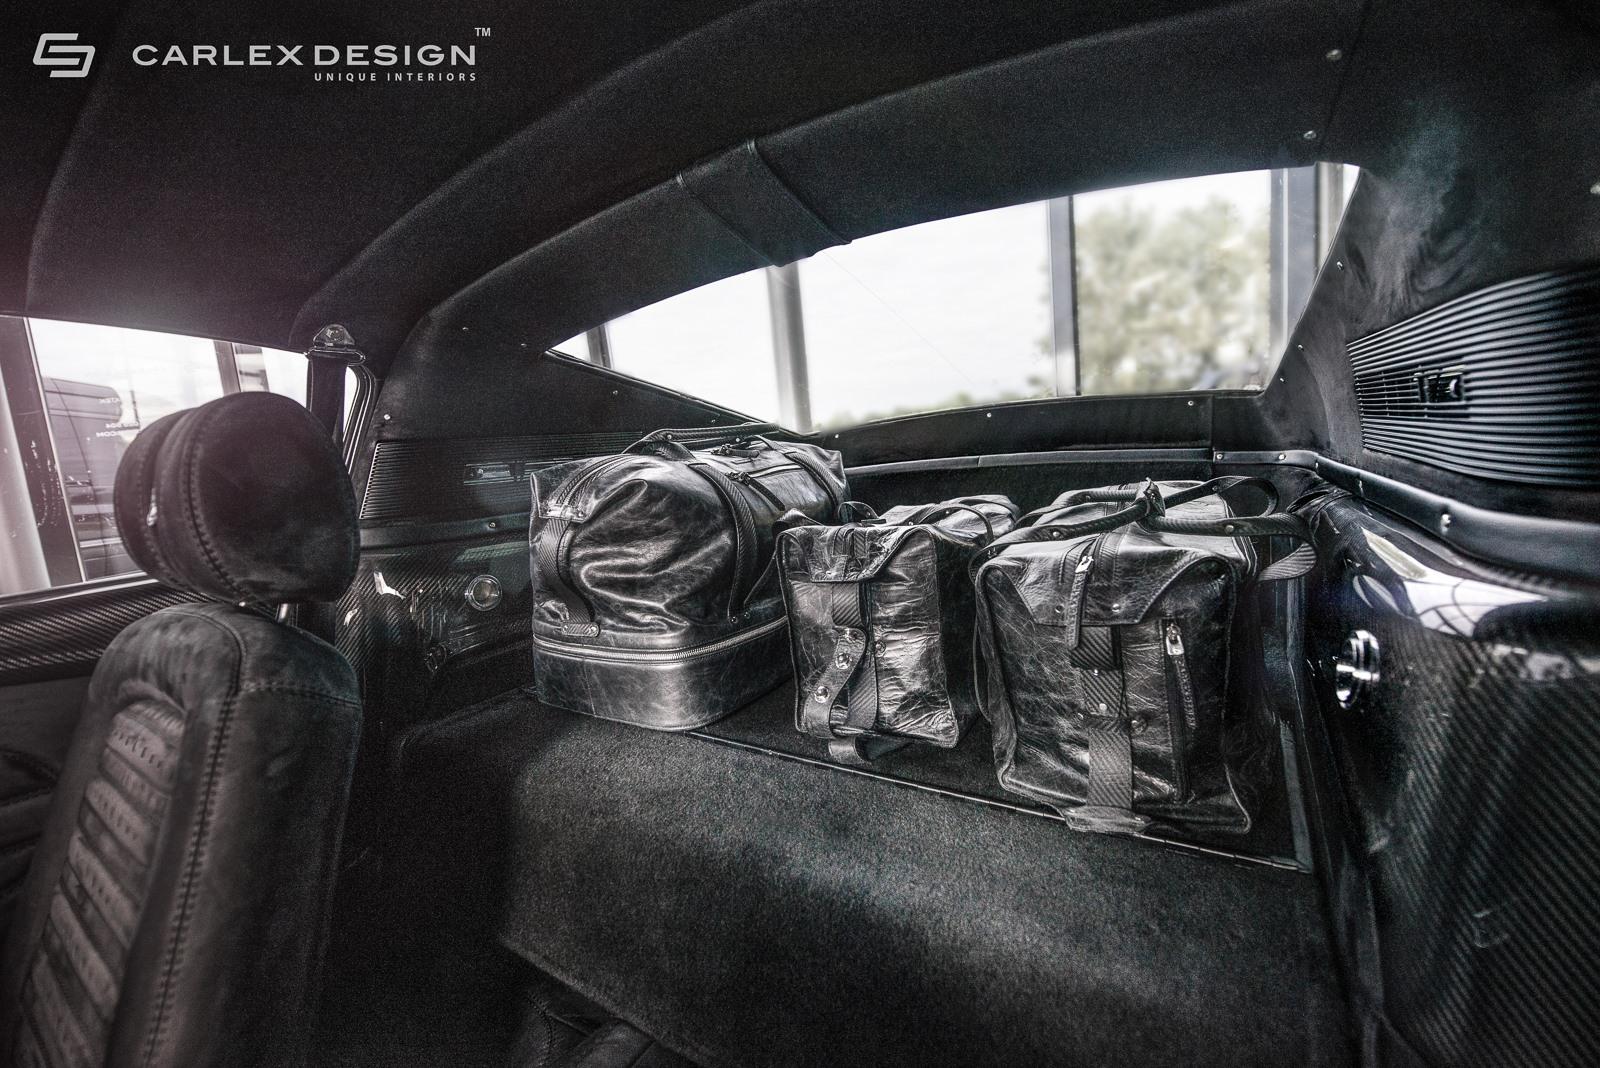 1967 Ford Mustang By Carlex Has Carbon Fiber And Alcantara